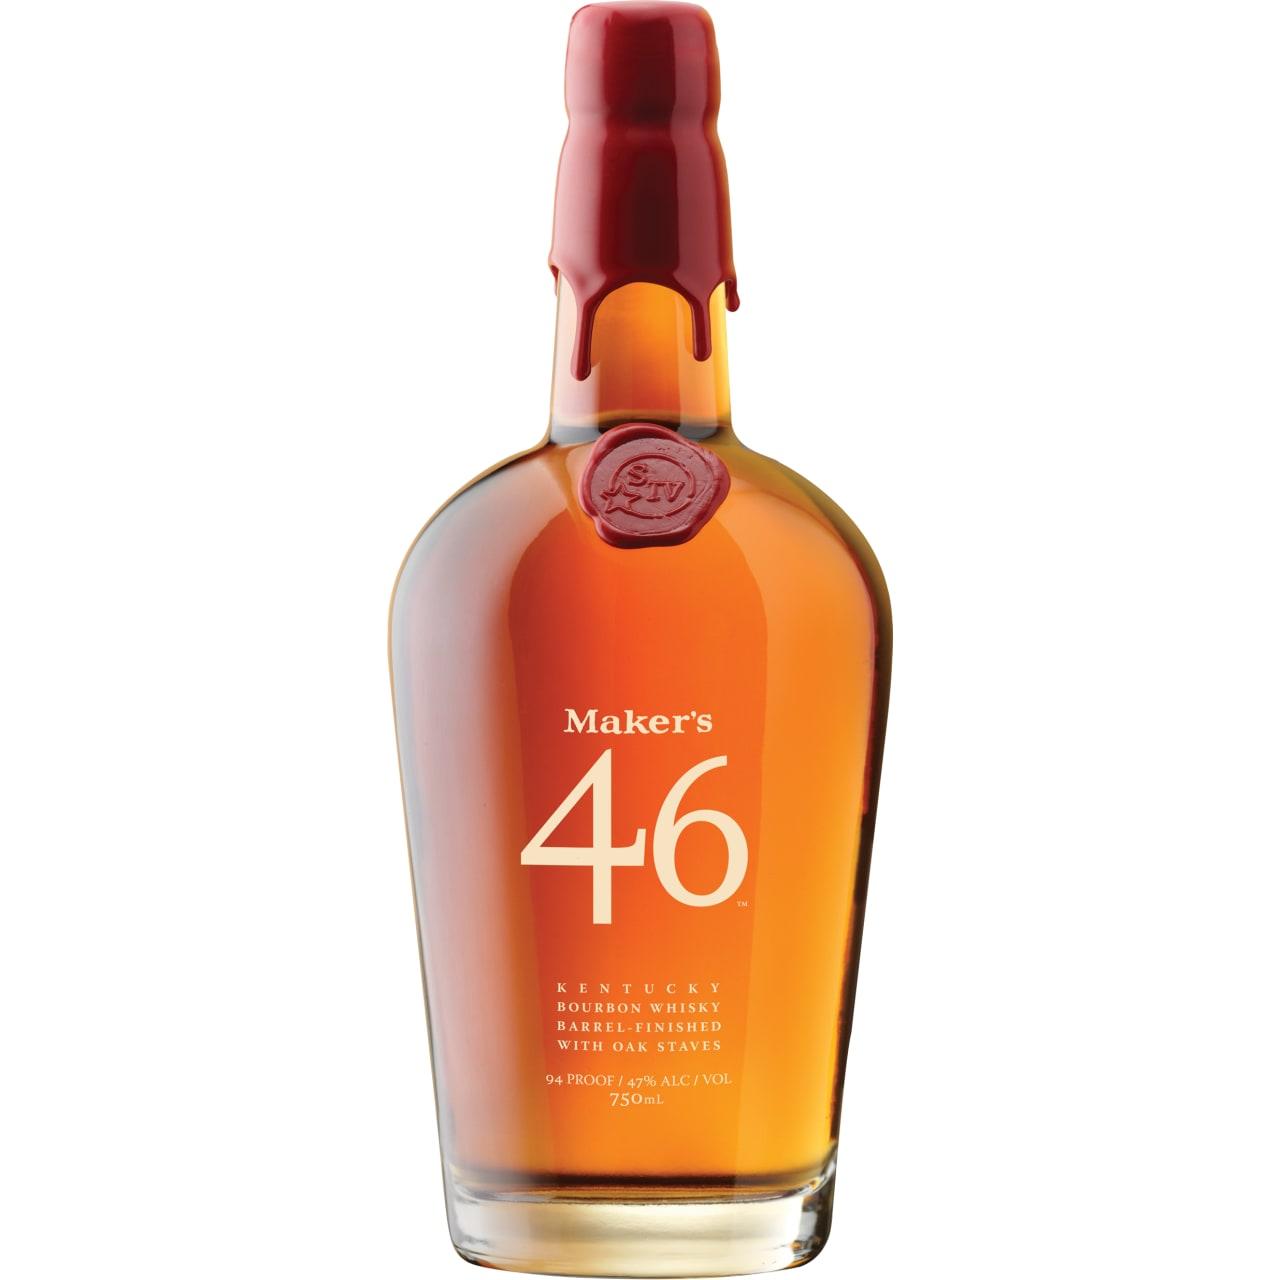 Product Image - Maker's Mark 46 Kentucky Bourbon